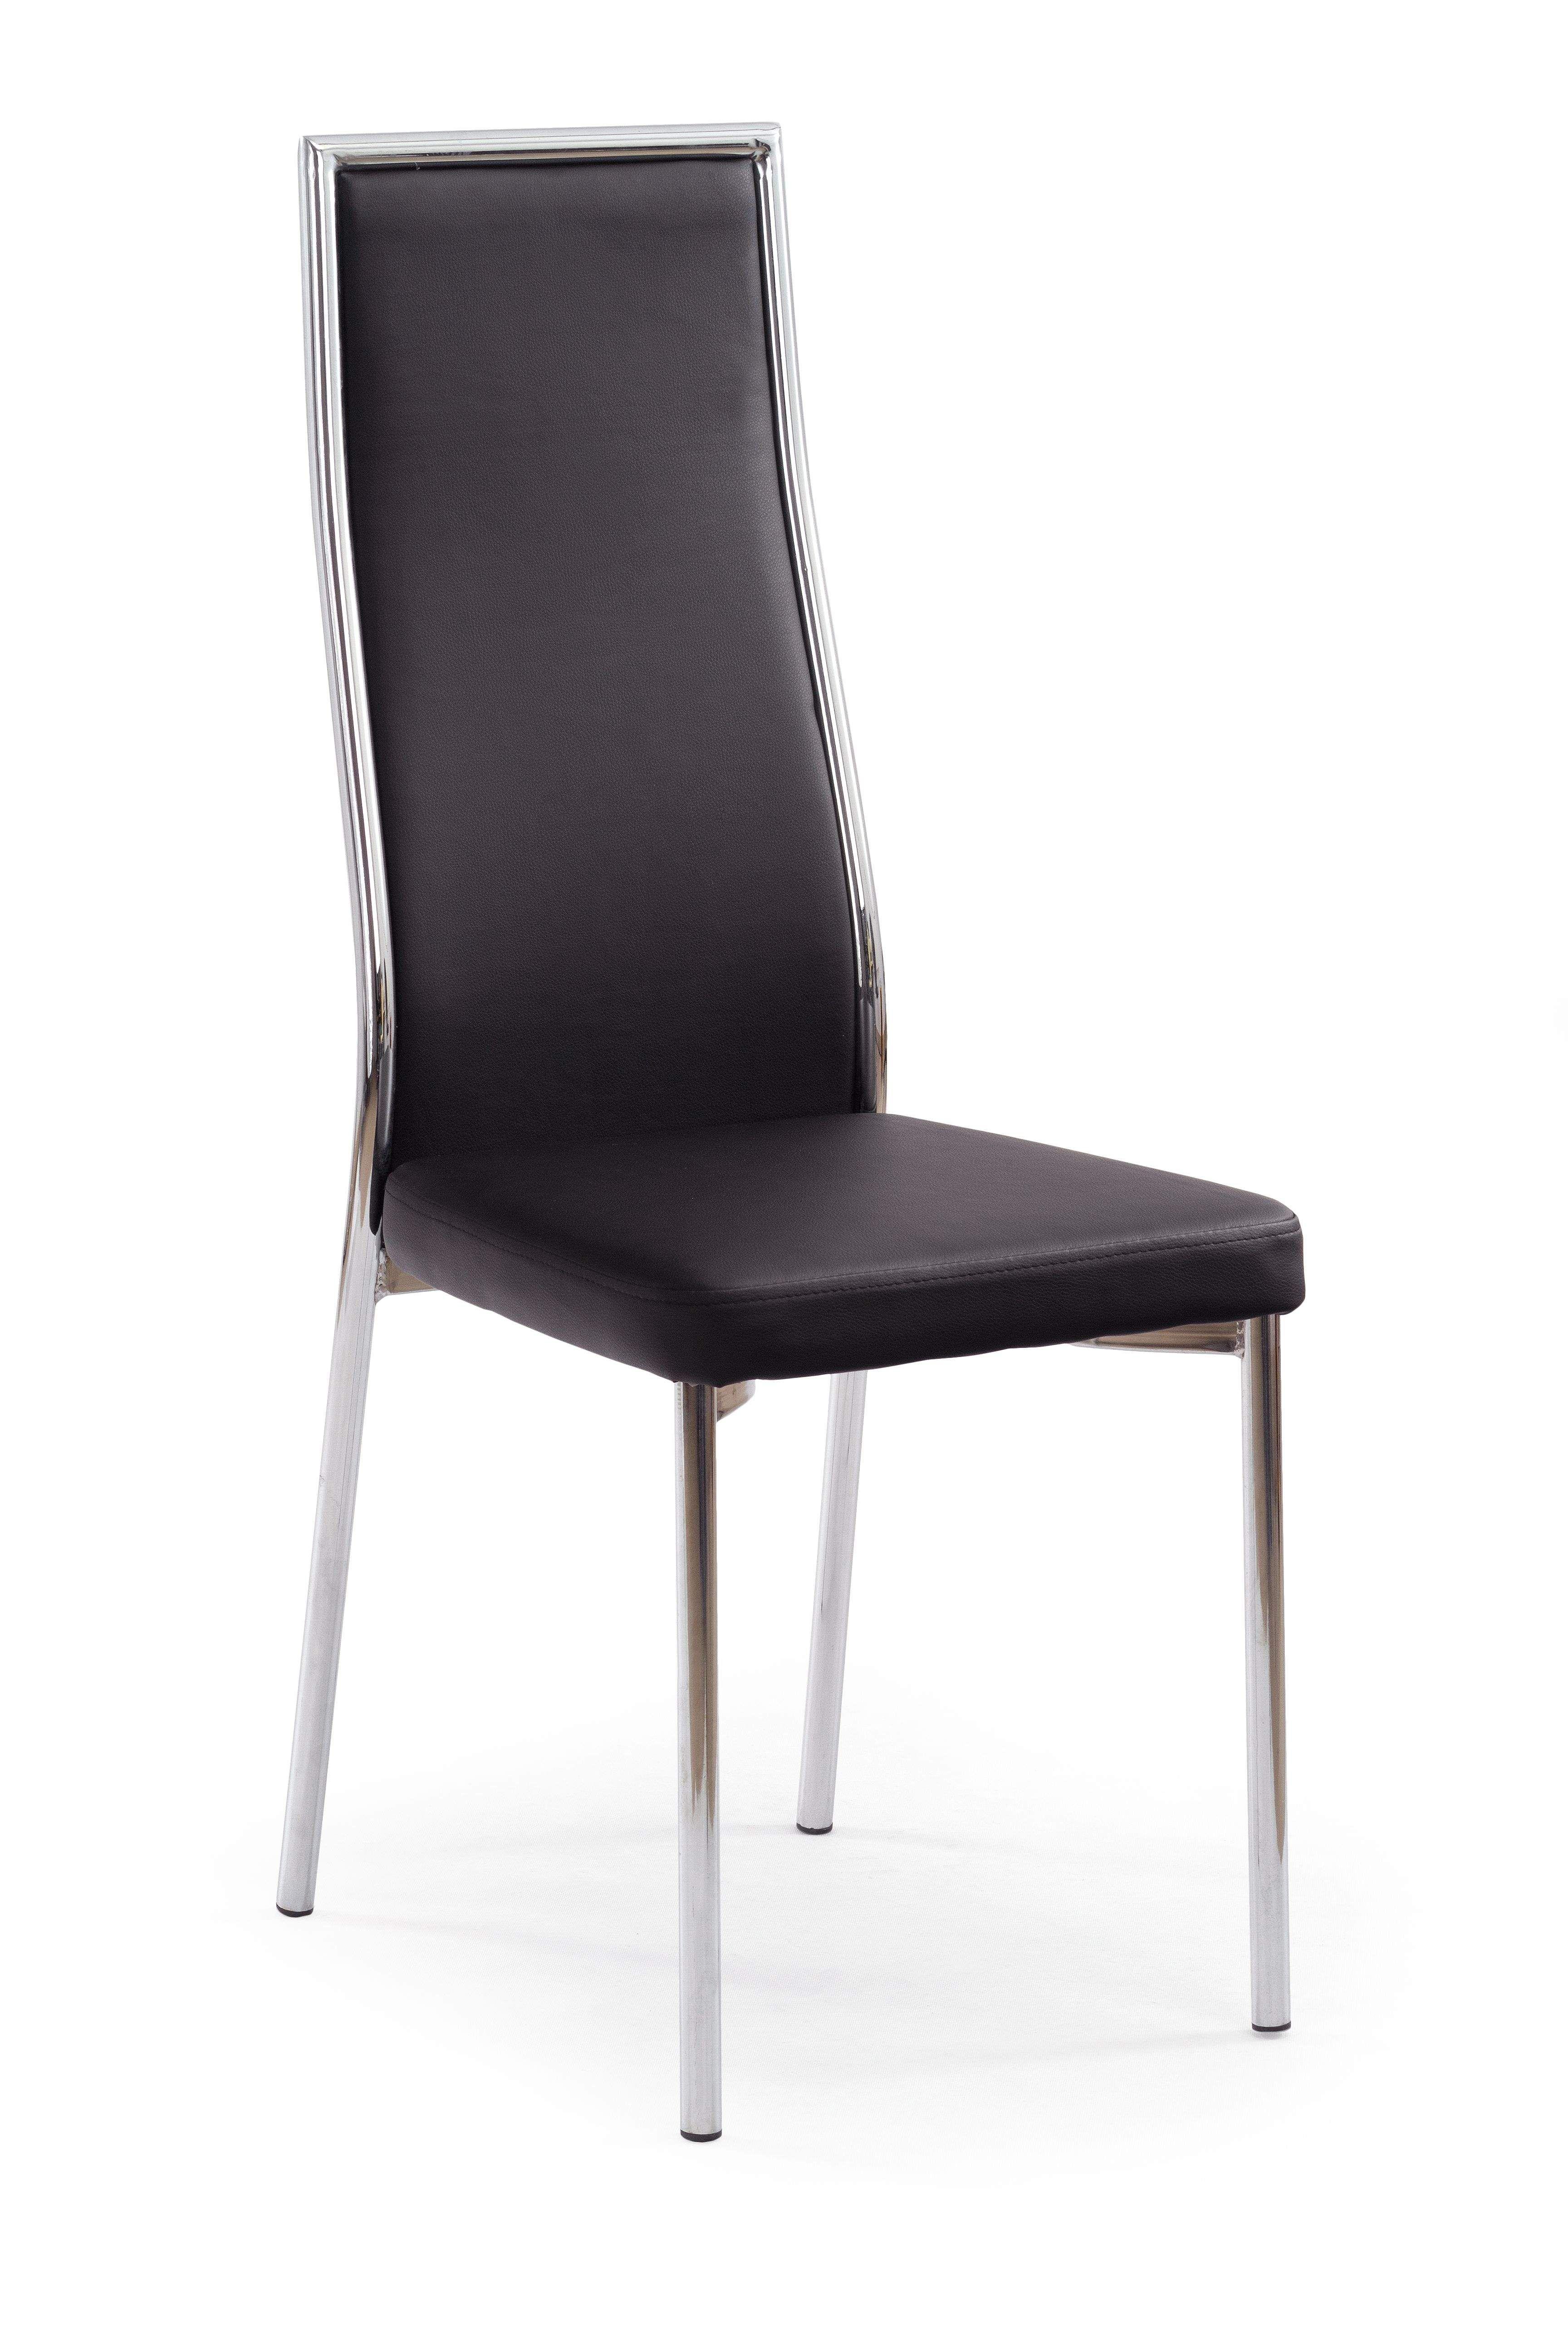 Kėdė K86 juoda